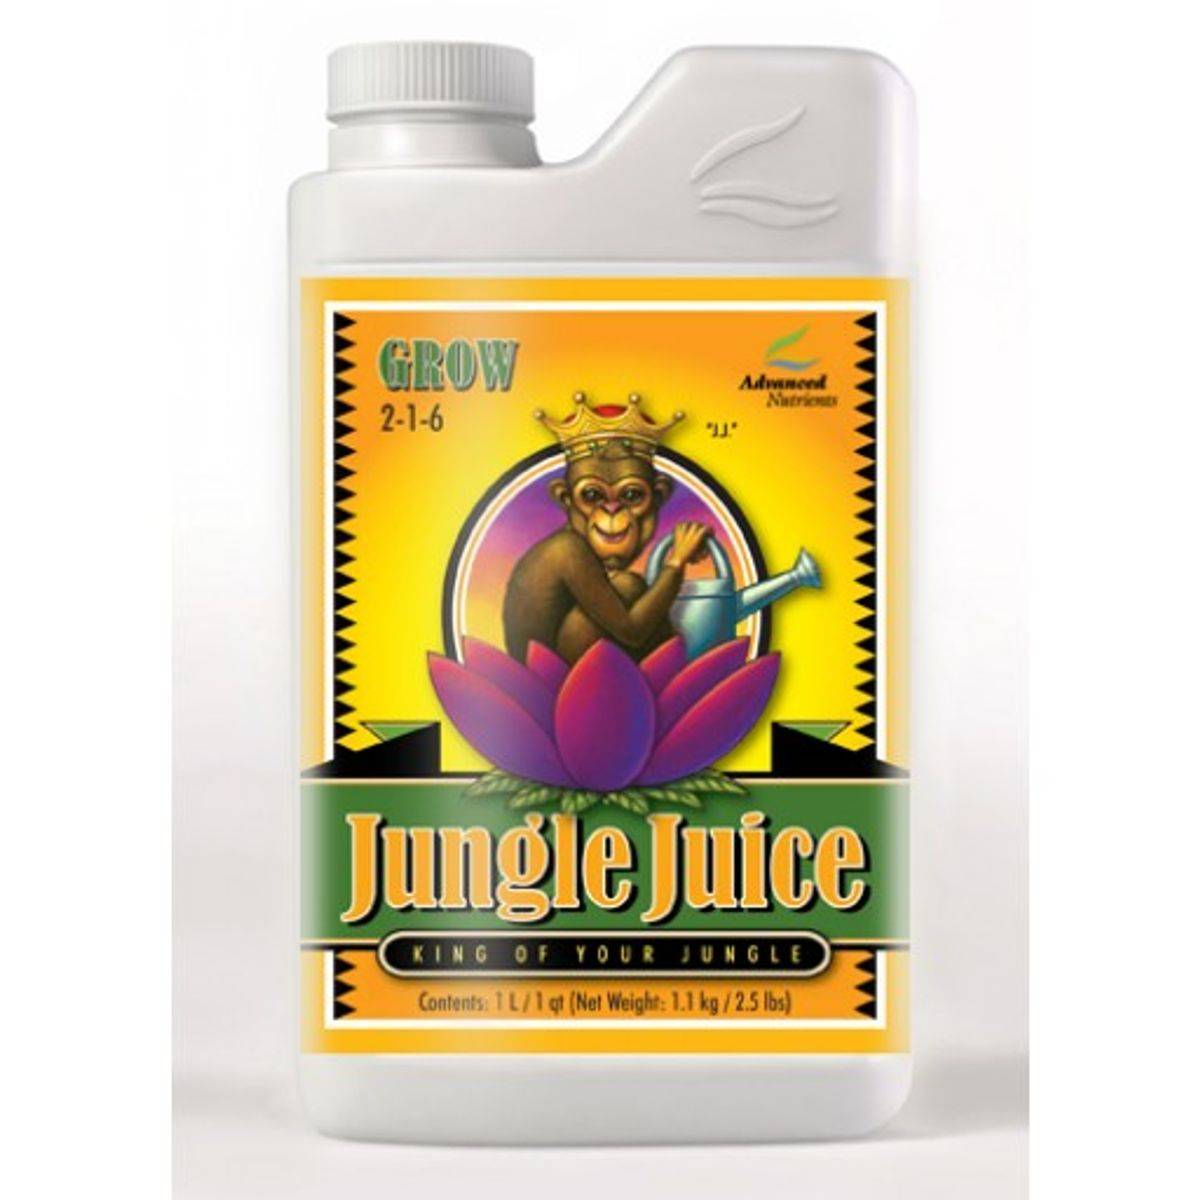 Jungle Juice Micro 5 L, Advanced Nutrients